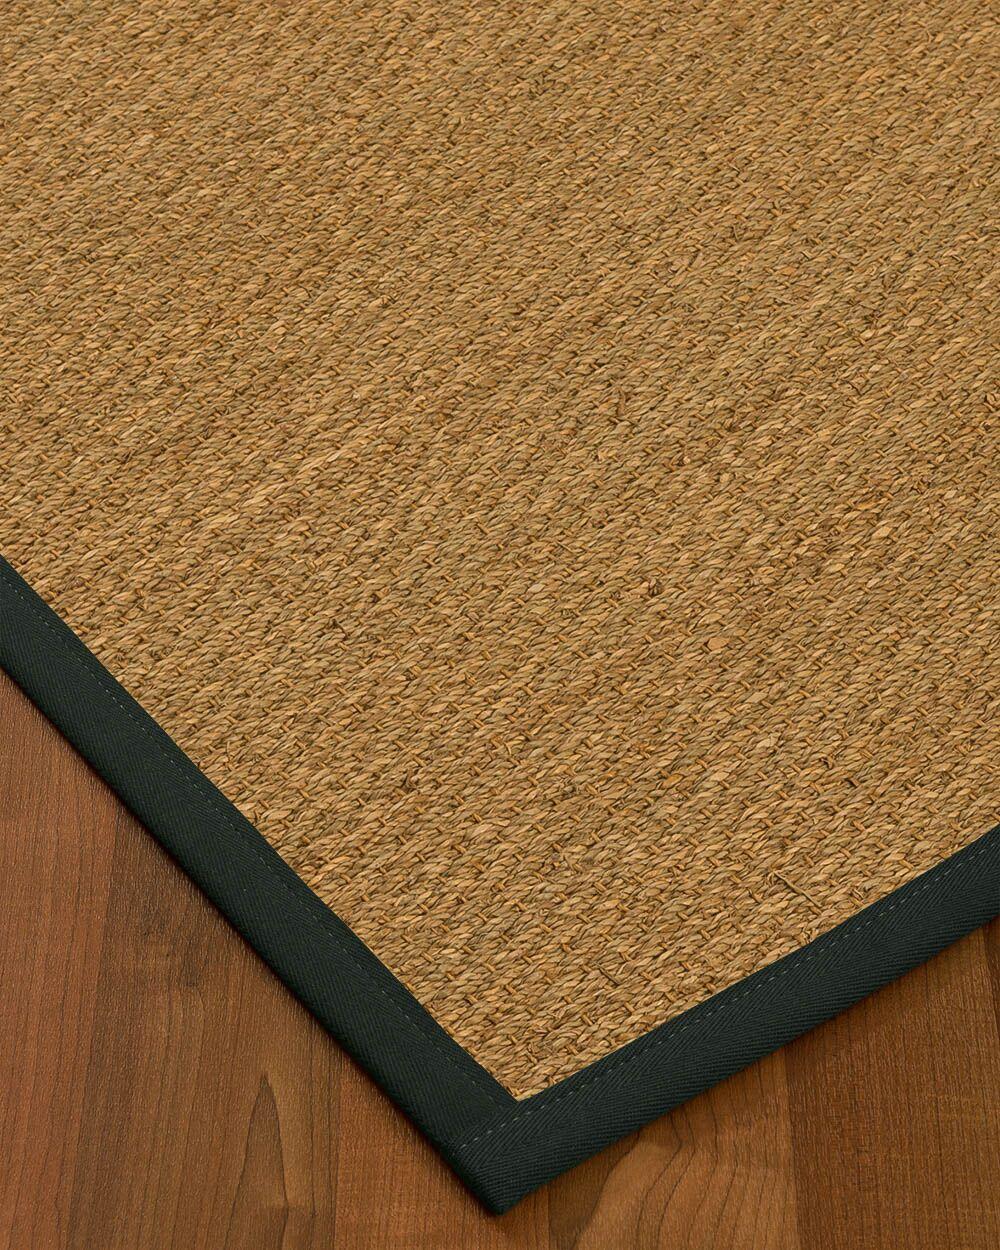 Anya Border Hand-Woven Beige/Onyx Area Rug Rug Pad Included: No, Rug Size: Rectangle 3' x 5'